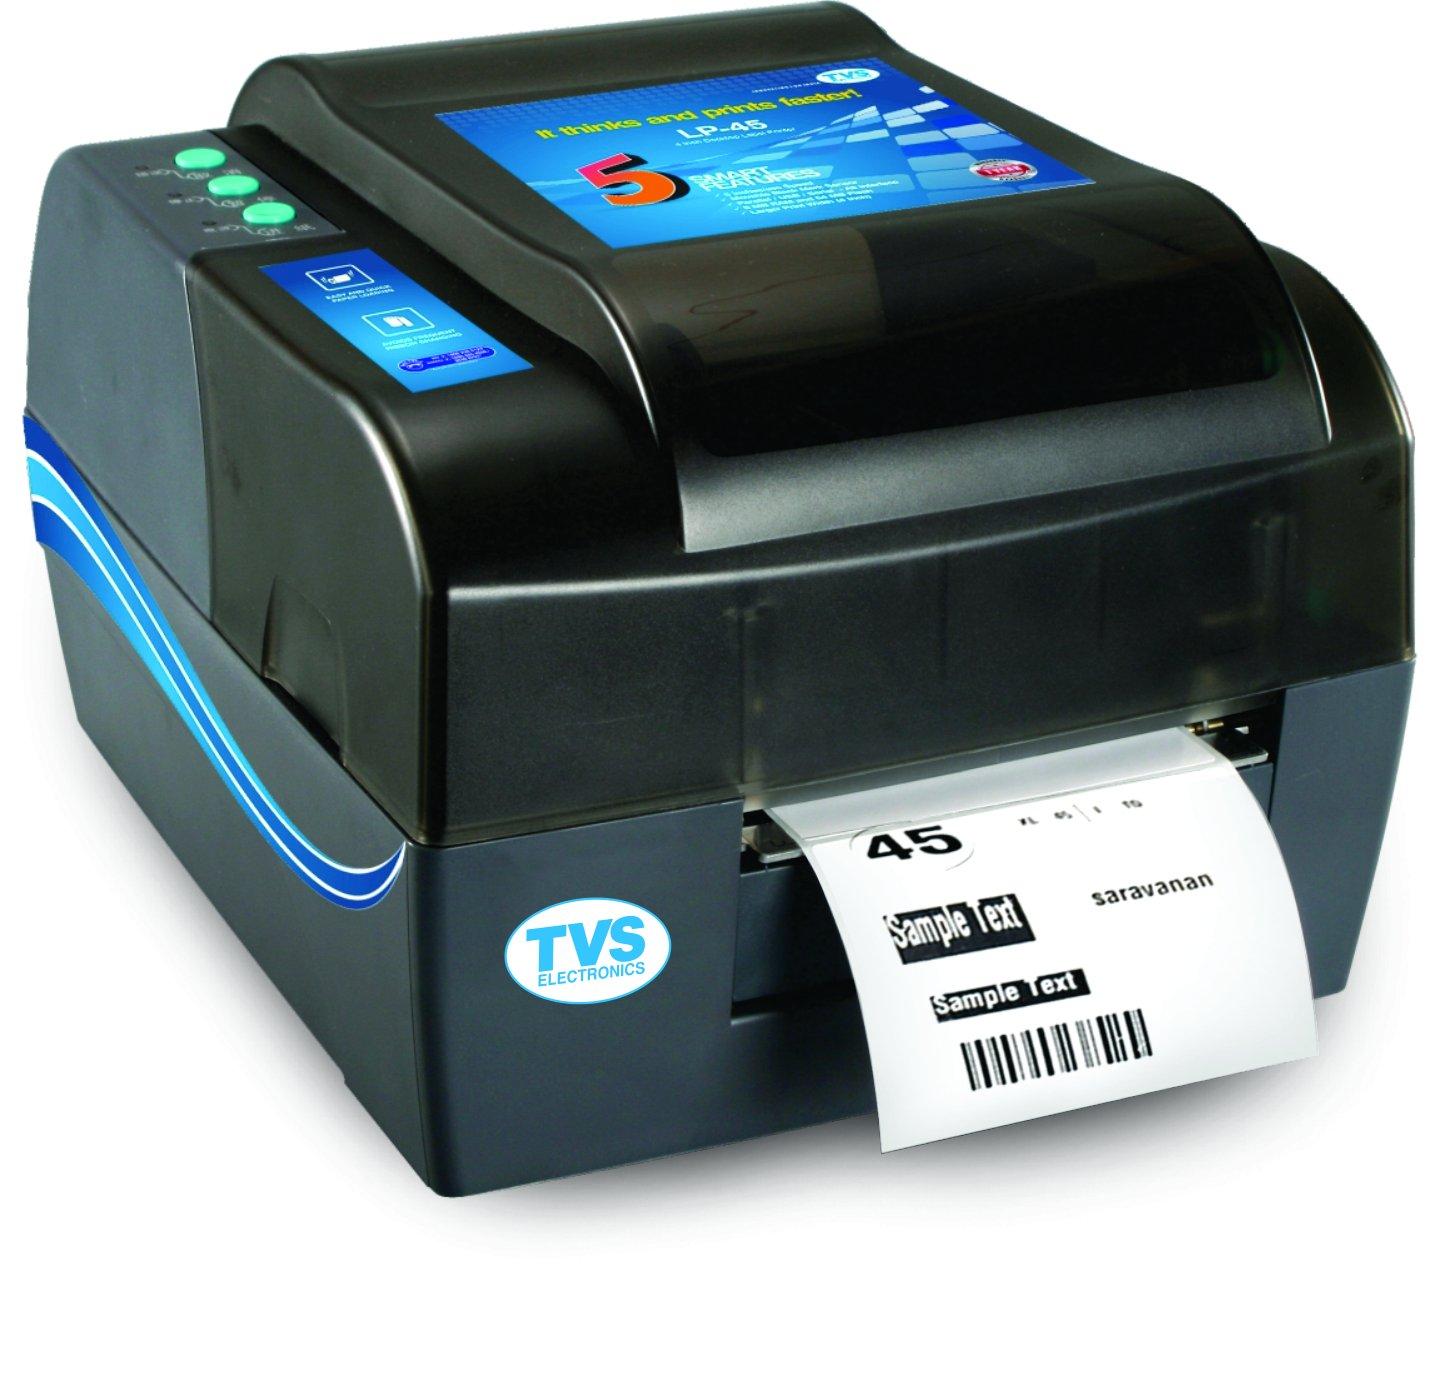 ac2bdda932a1 Tvs LP-45 Barcode Label Printer: Amazon.in: Amazon.in